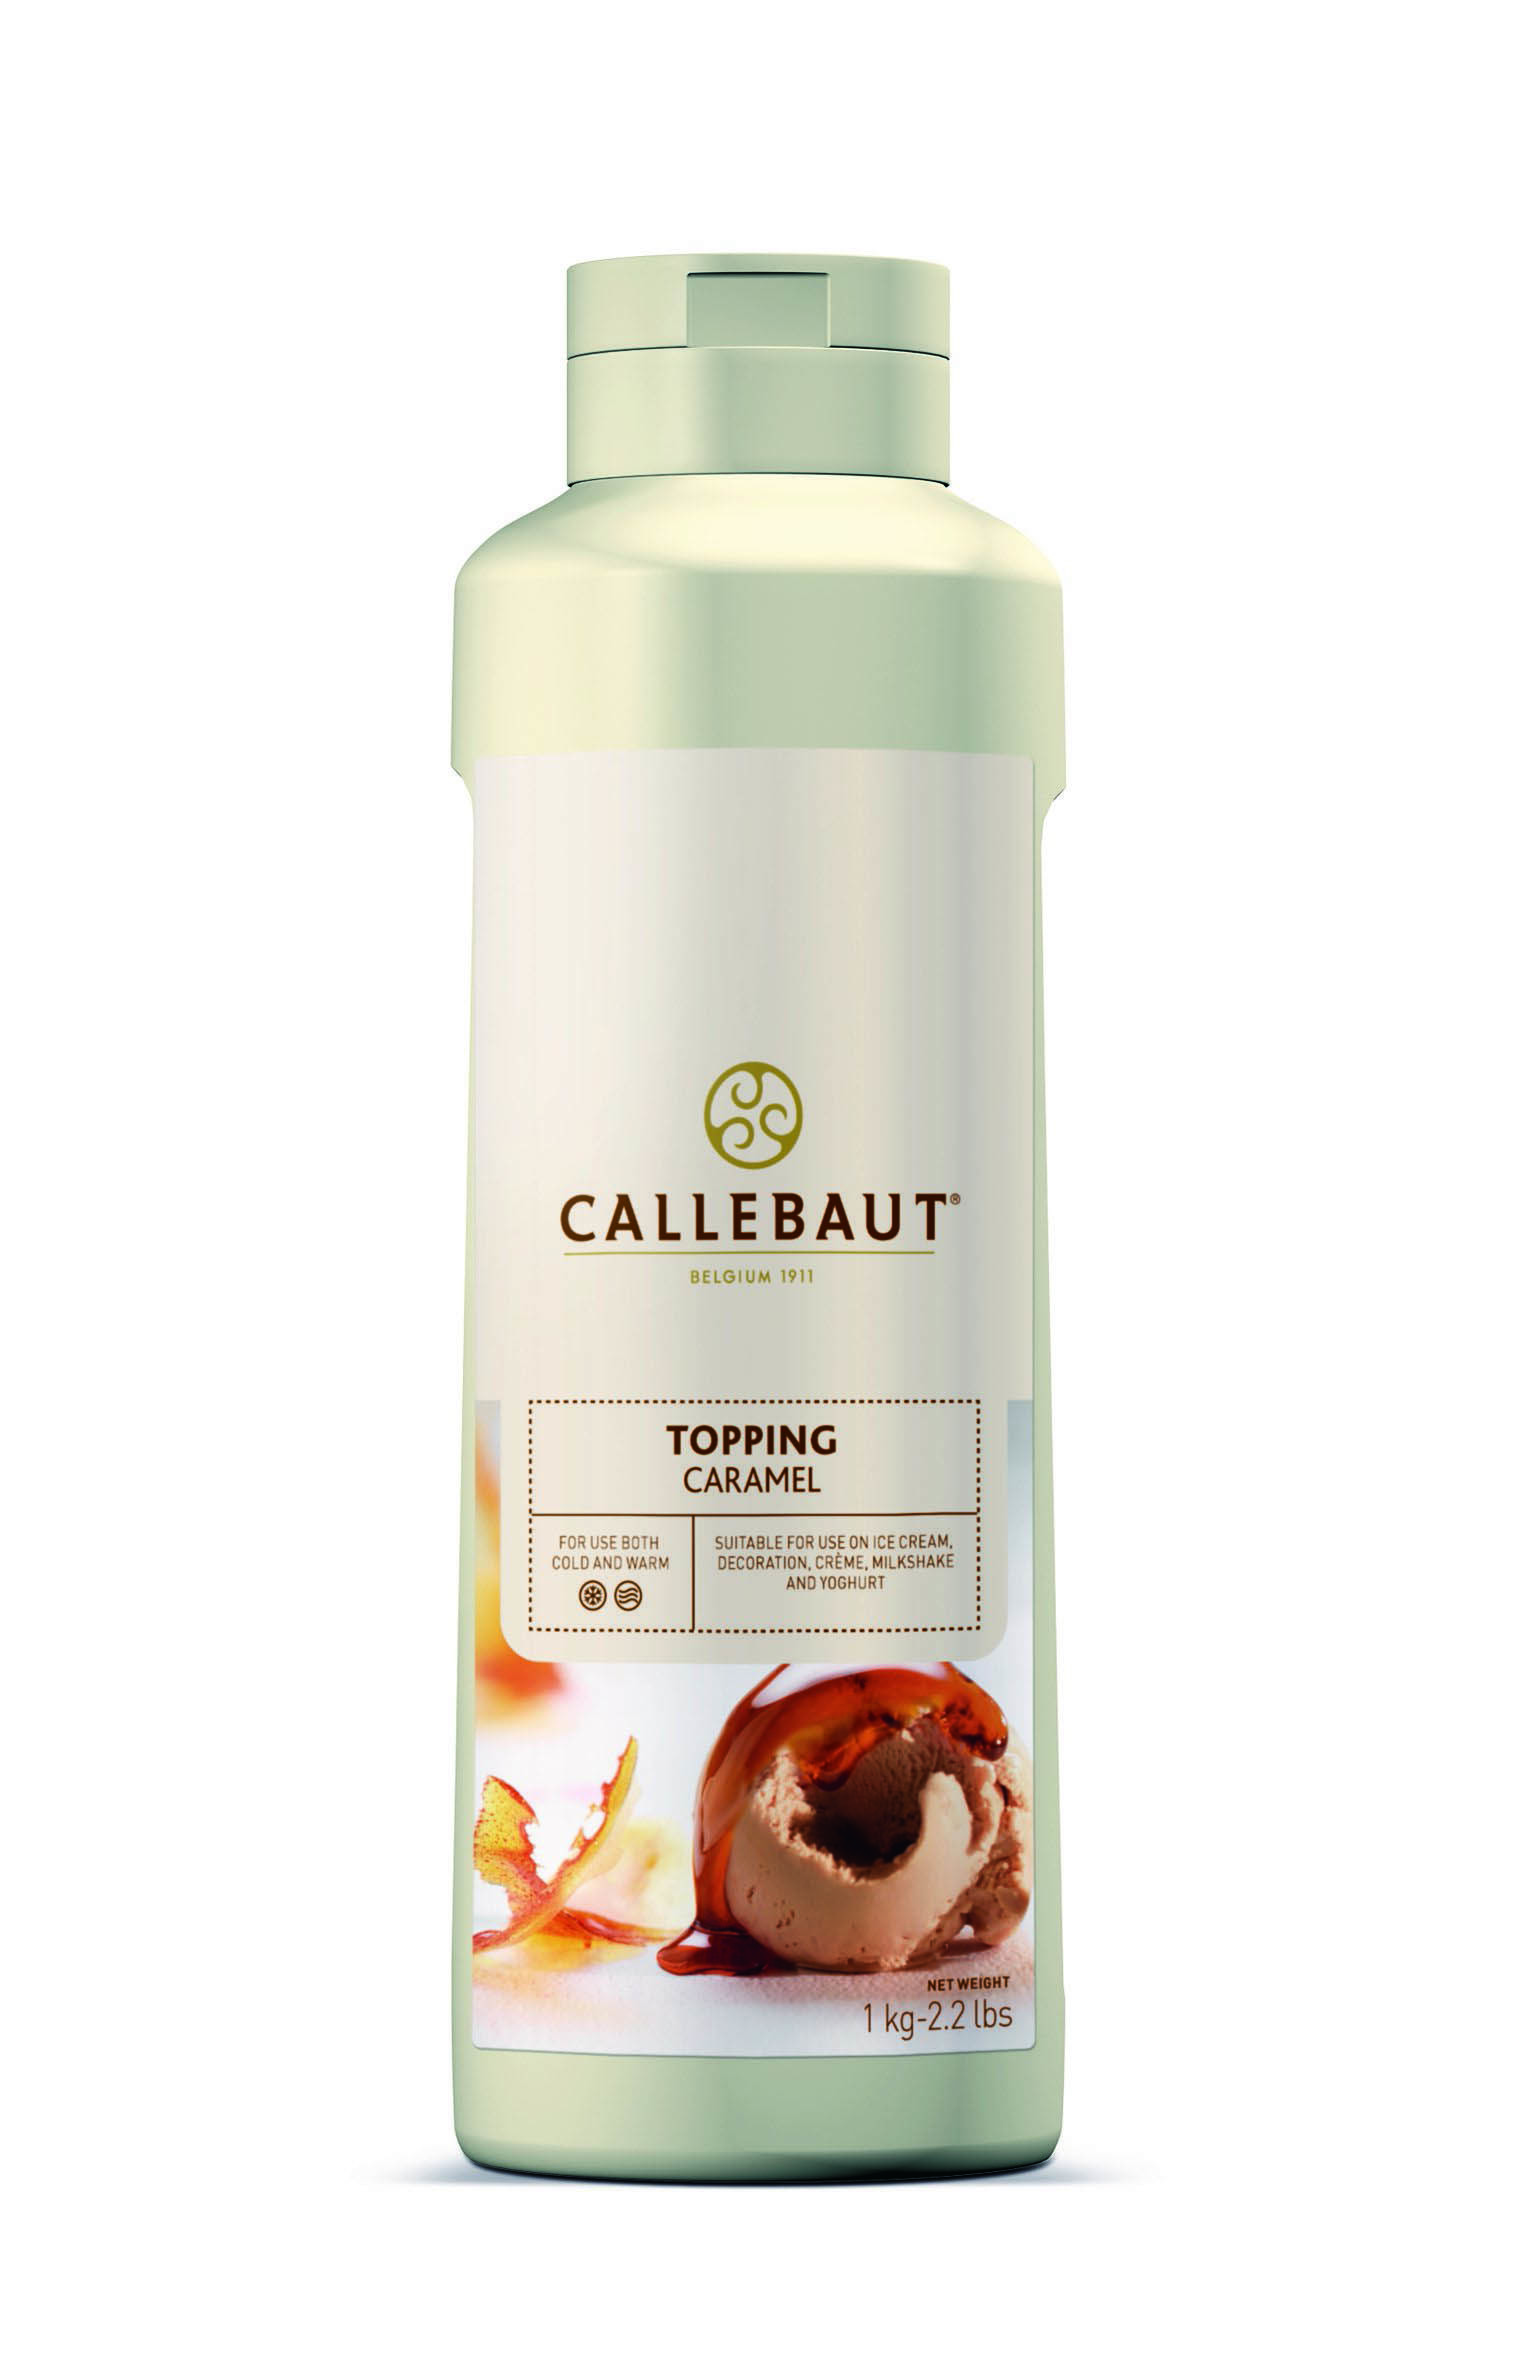 Topping caramel 1L Callebaut bouteille pinçable